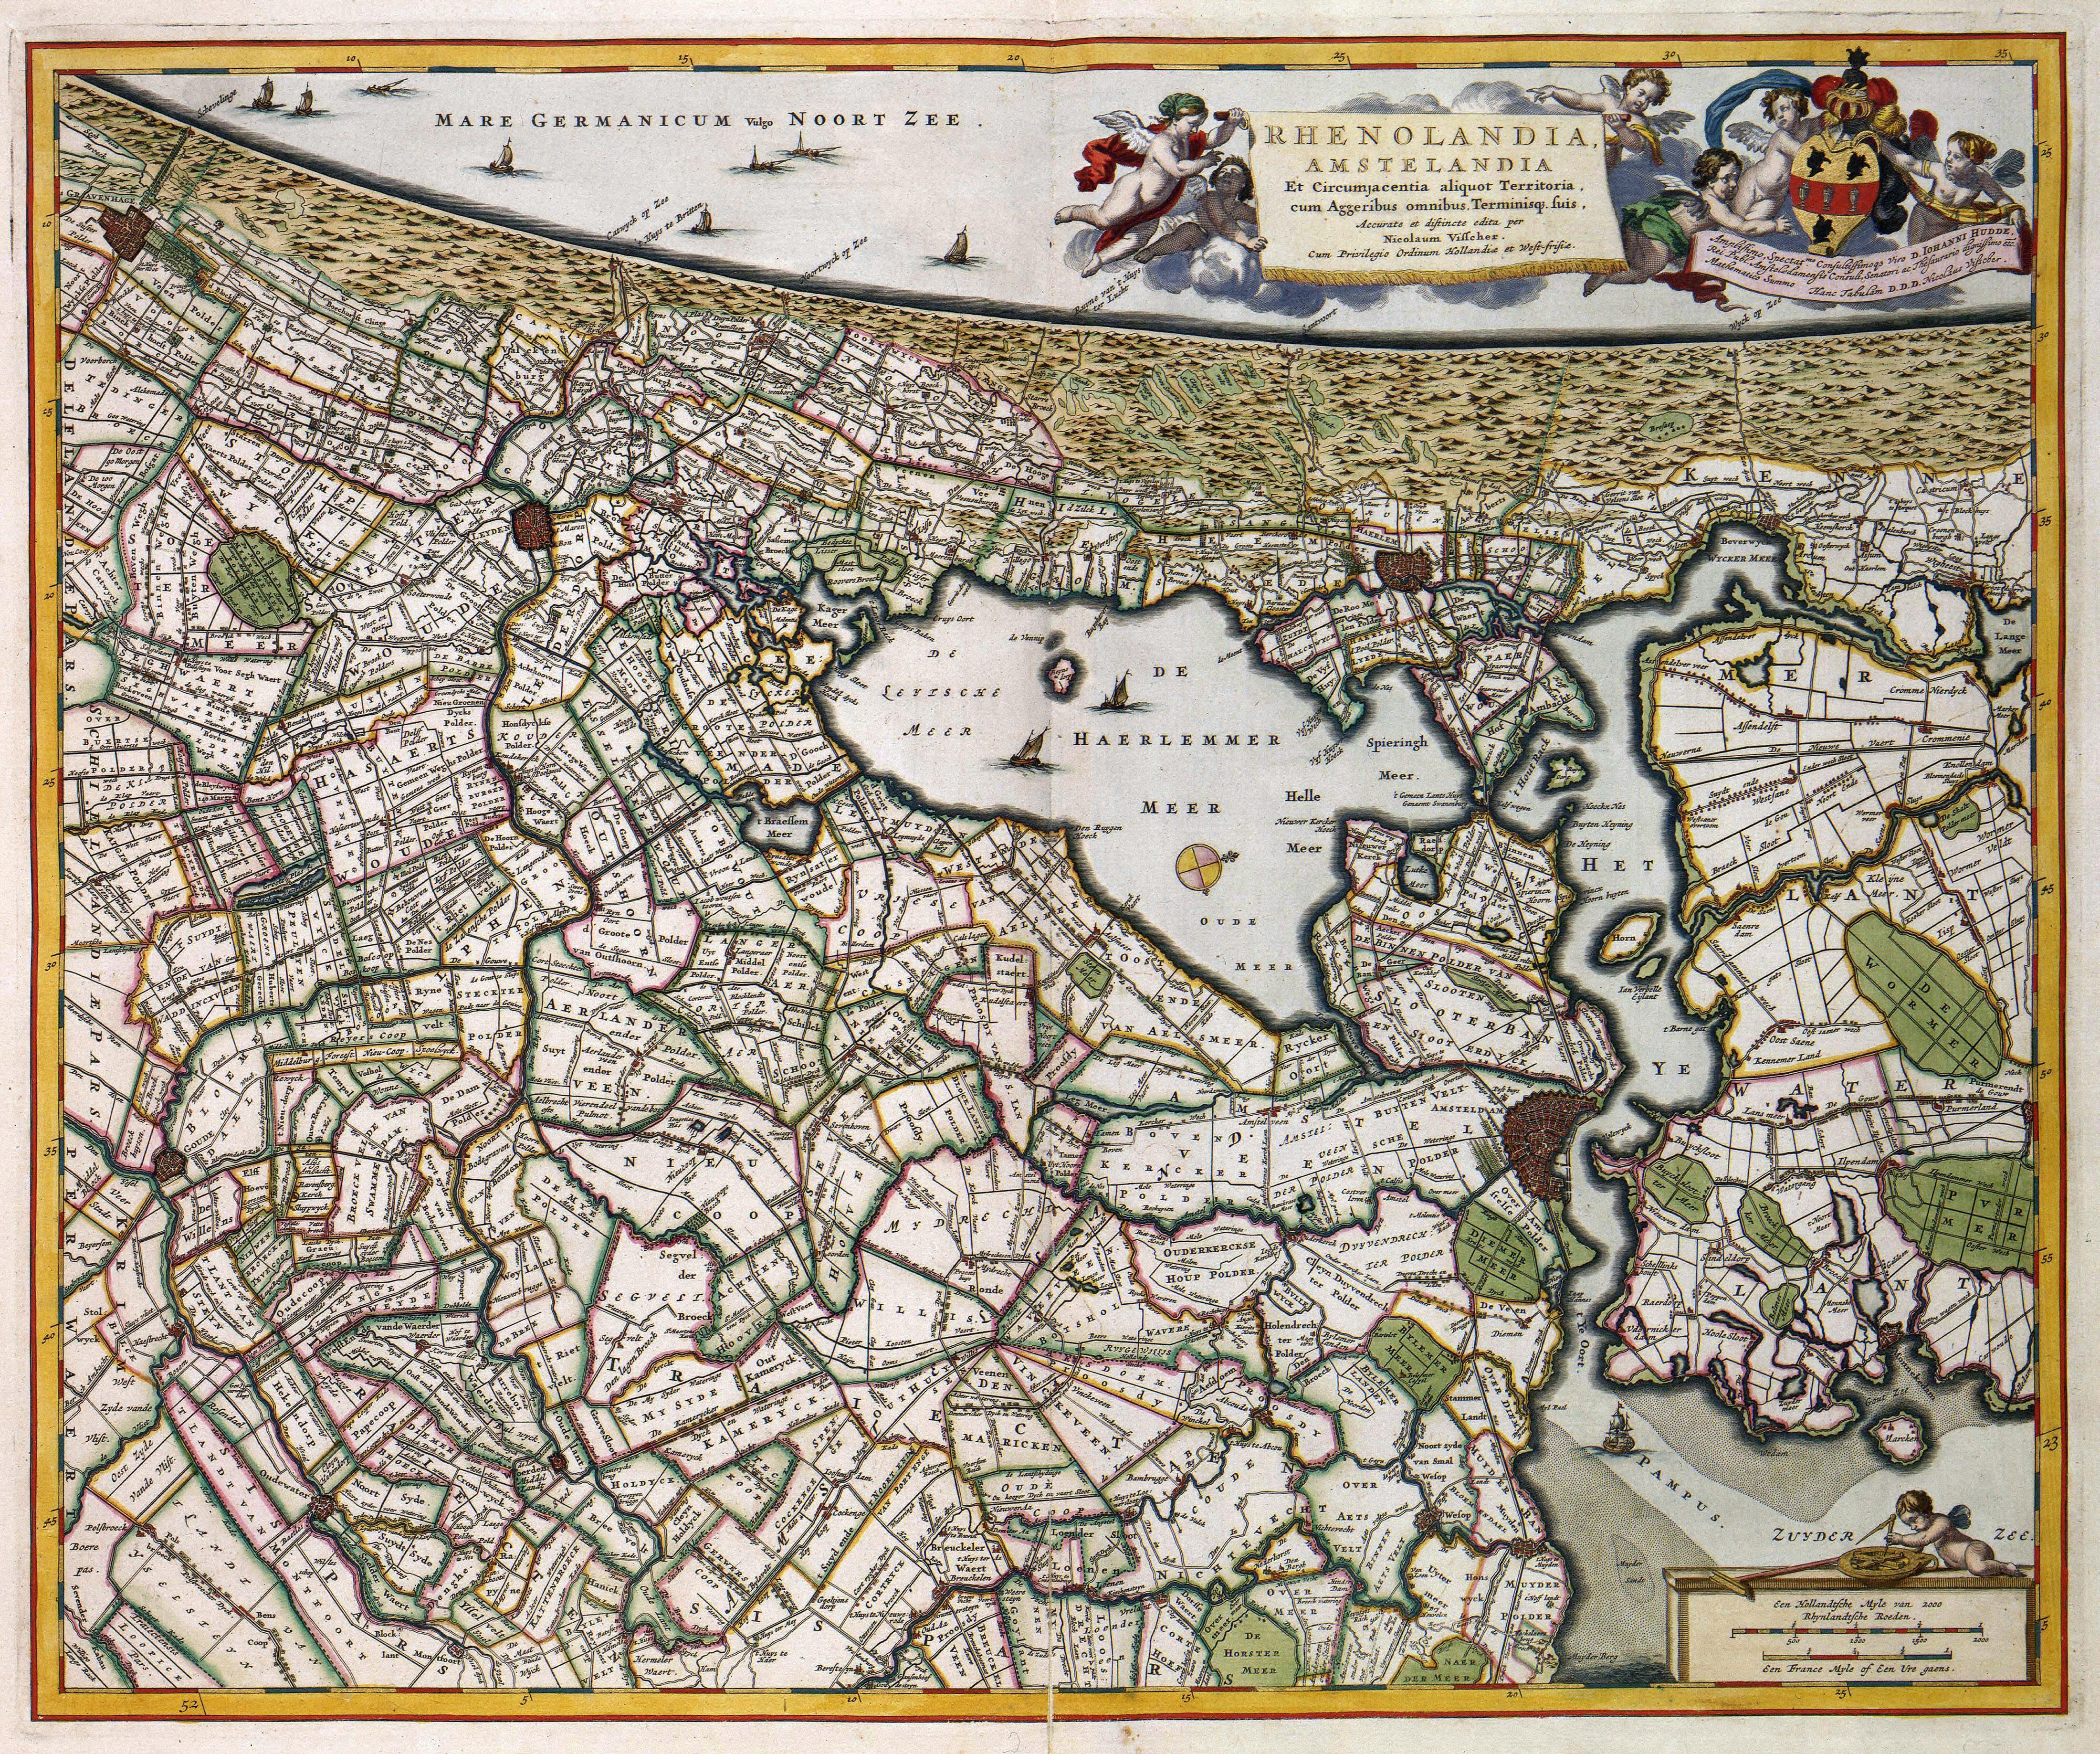 Файл:RHENOLANDIA AMSTELANDIA 1681.jpg